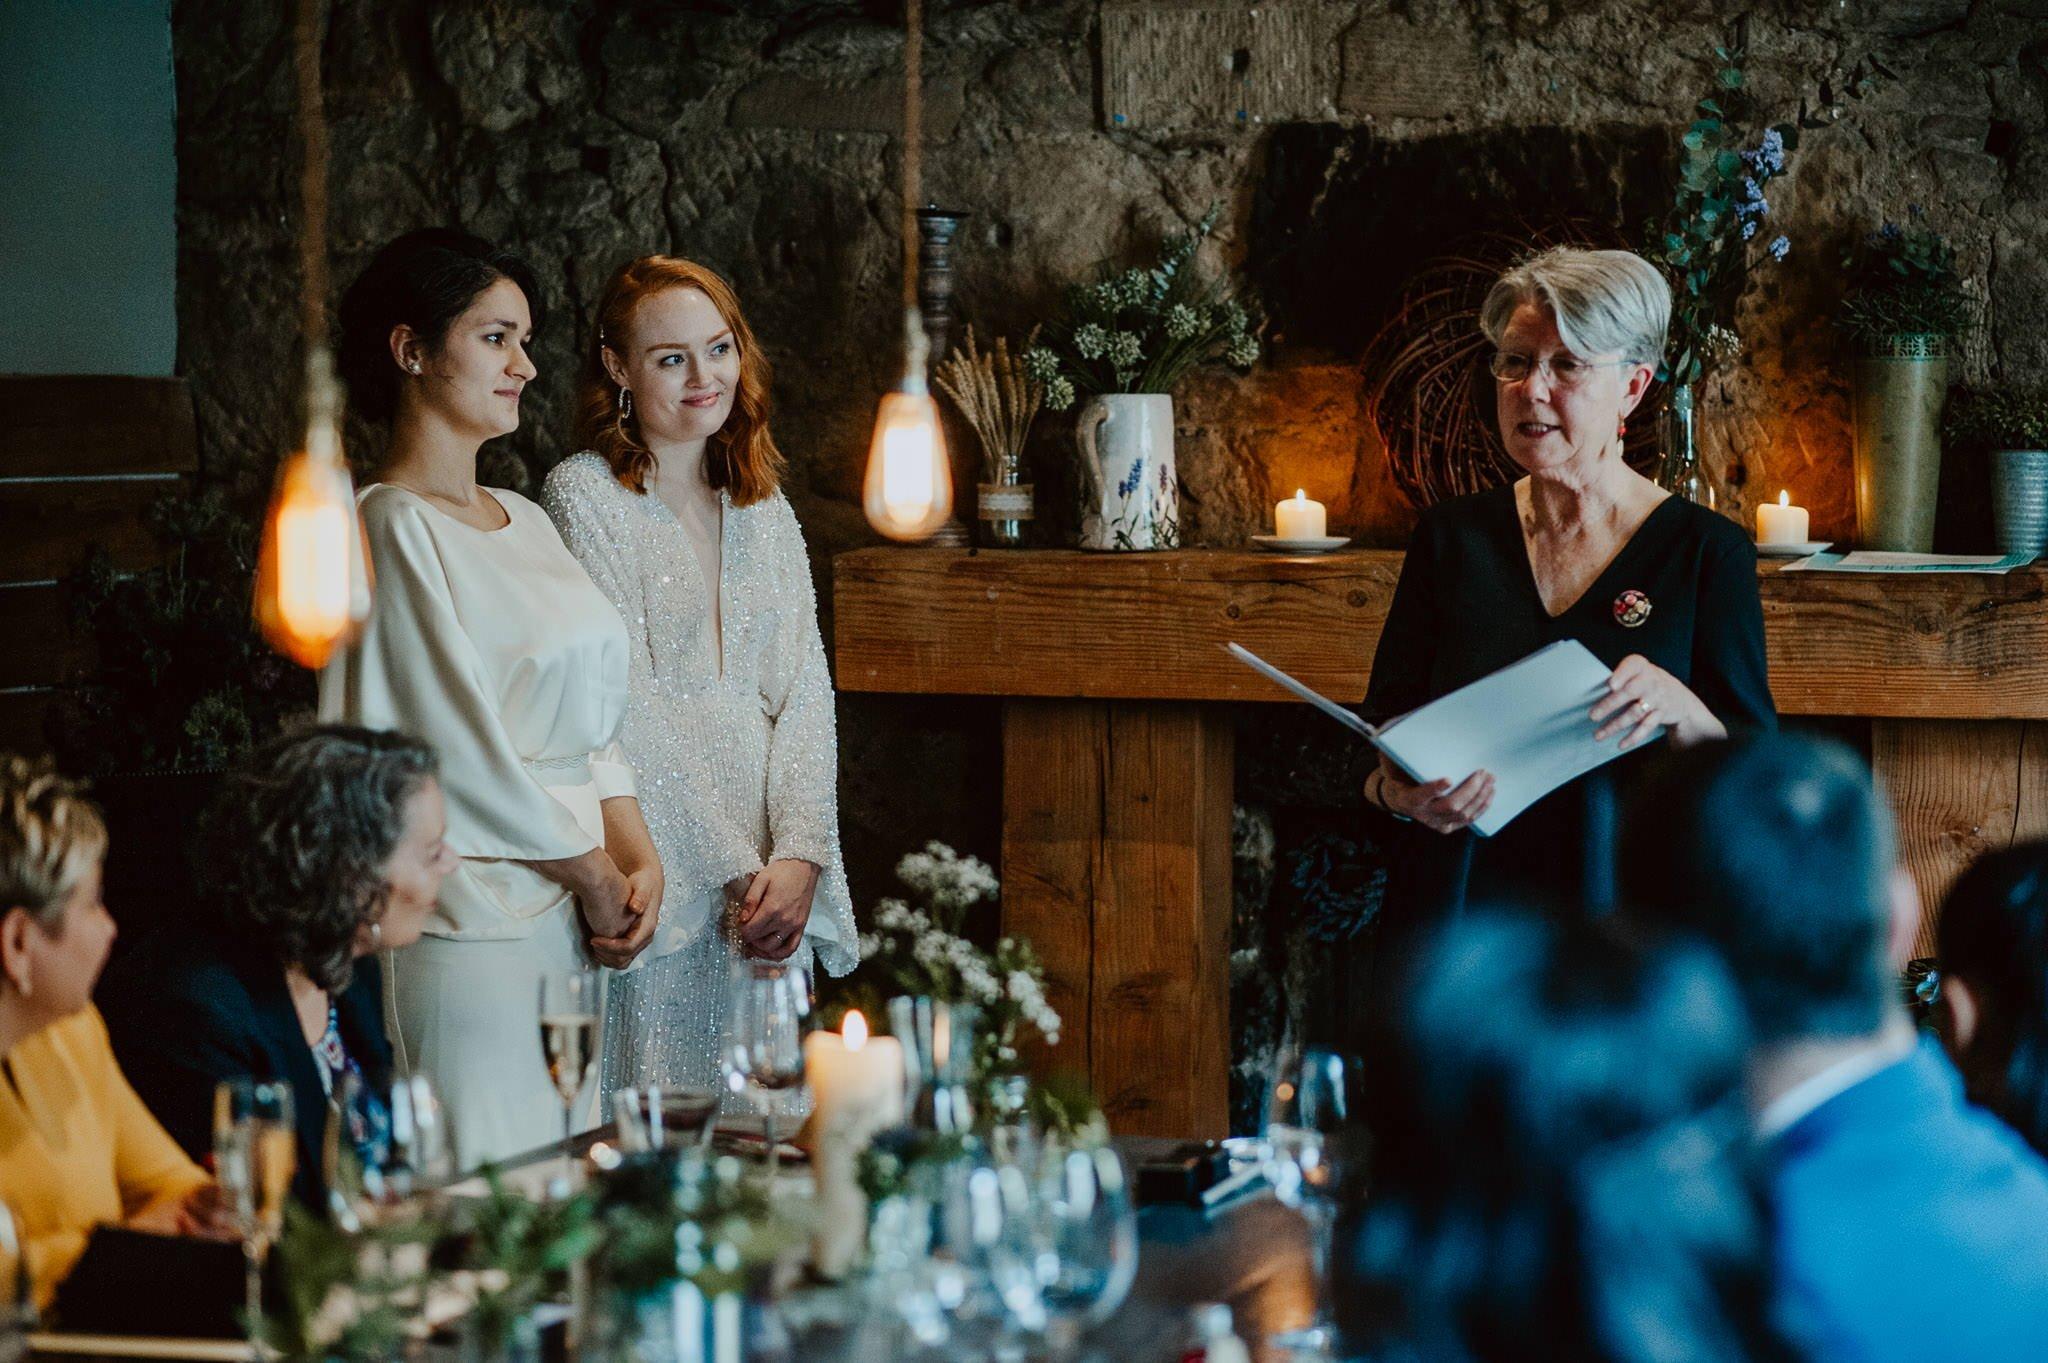 A Dreamy Pre-Raphaelite Wedding at the Bothy in Glasgow 25